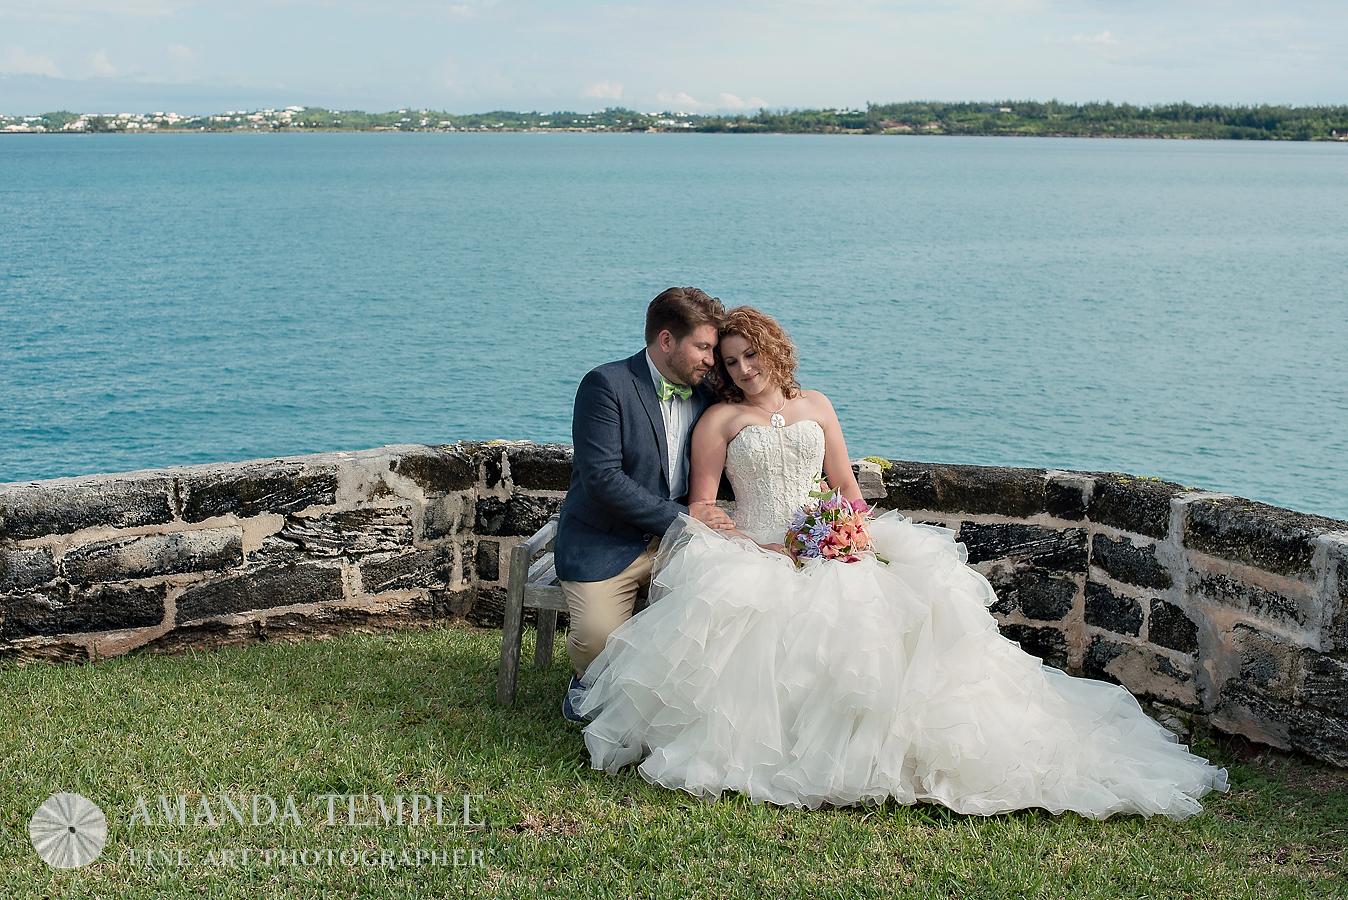 Bermuda Photographer - Amanda Temple: Rachel and James Trash the Dress